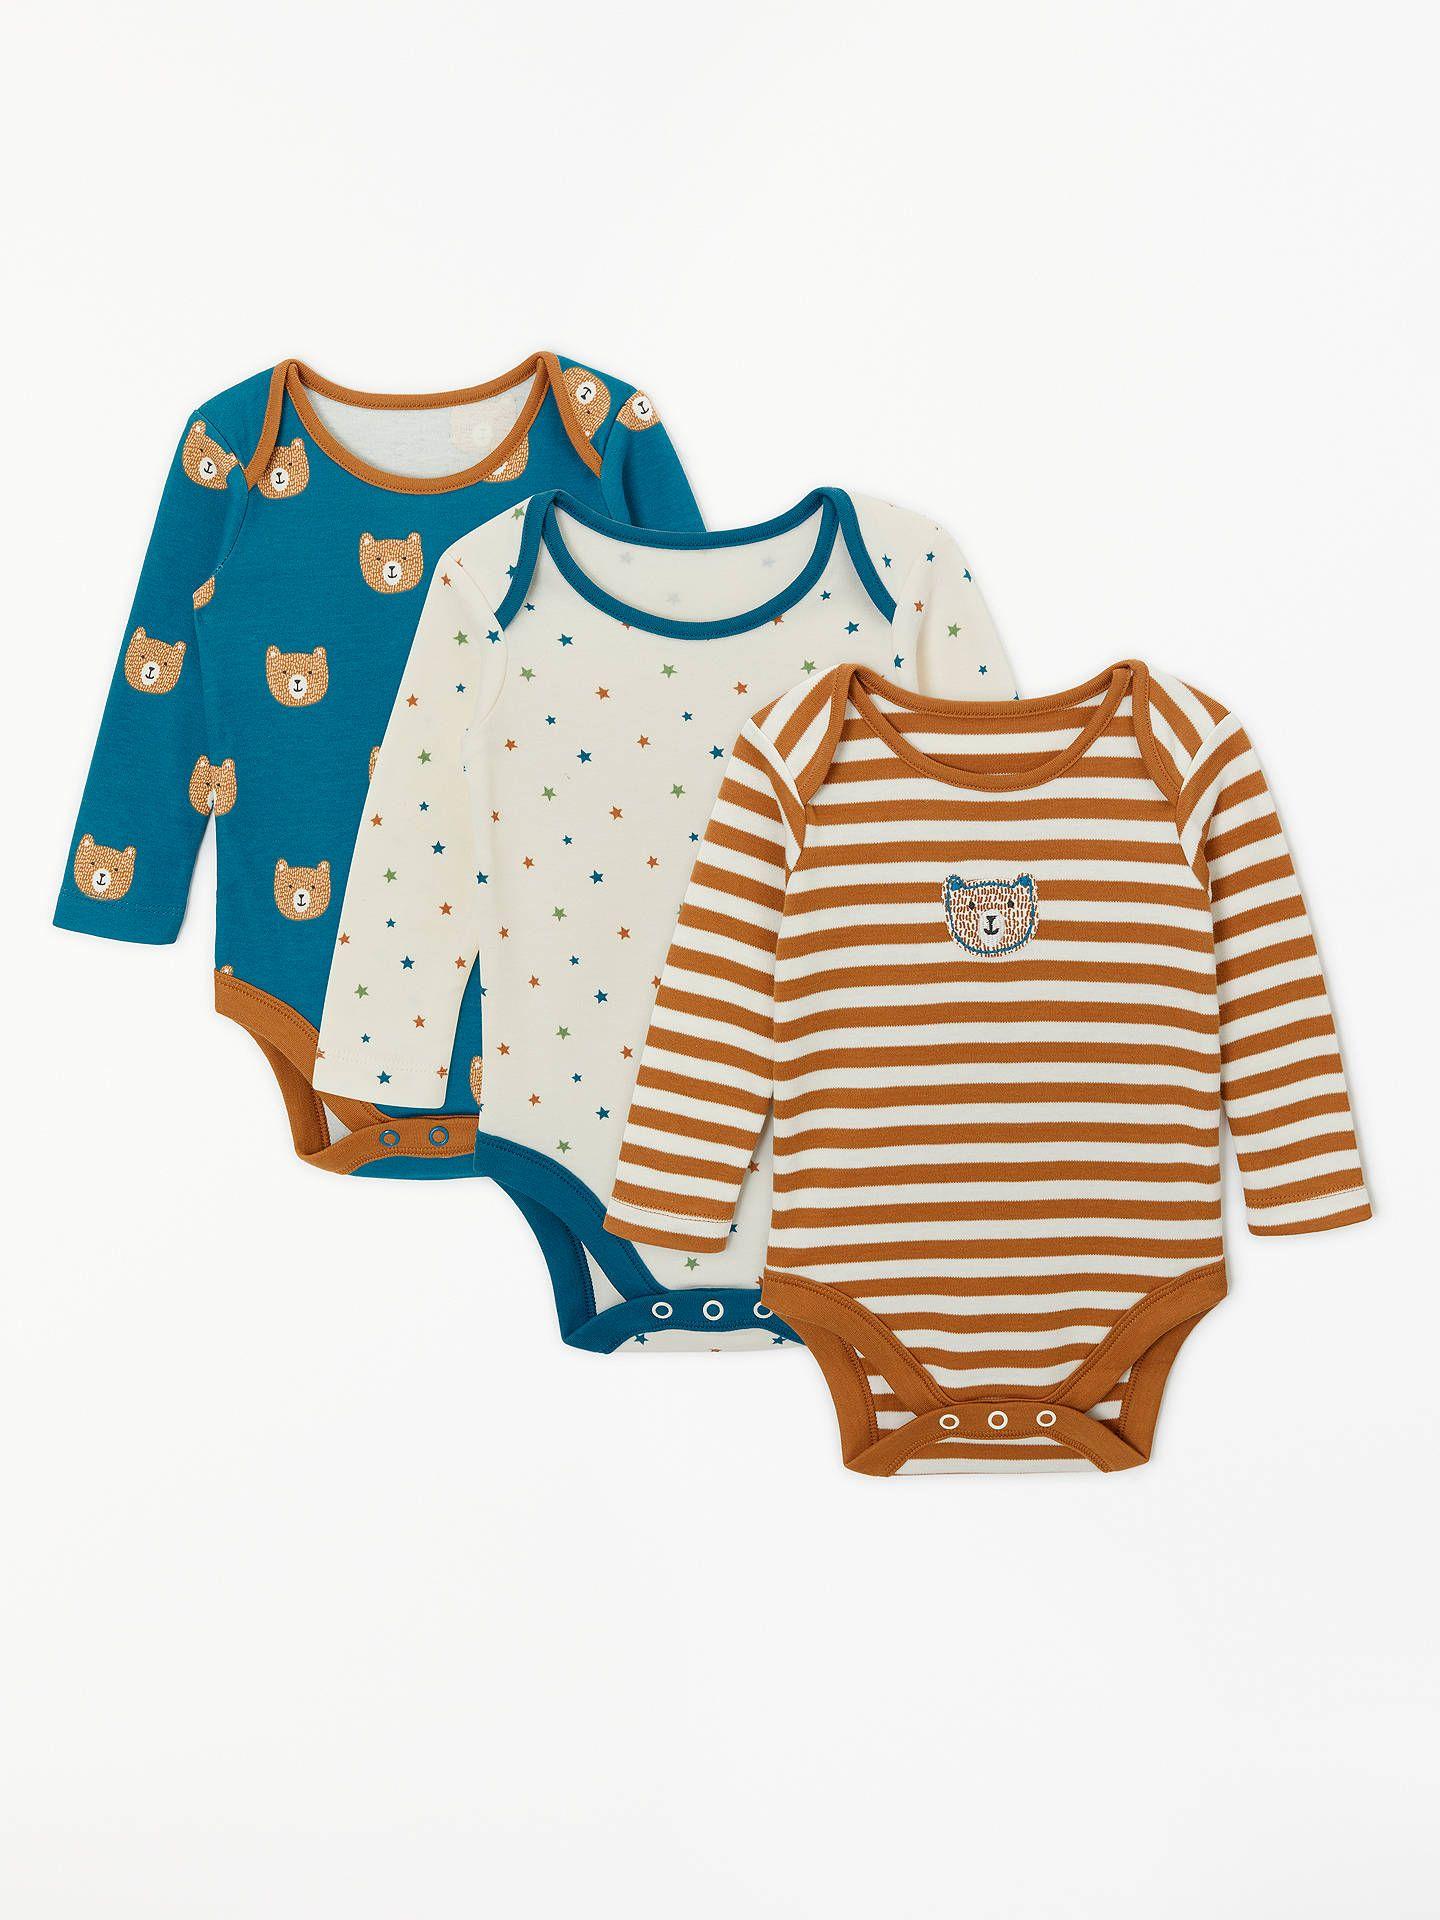 239e669ca5e BuyJohn Lewis   Partners Baby GOTS Organic Cotton Bear Face Long Sleeve  Bodysuits